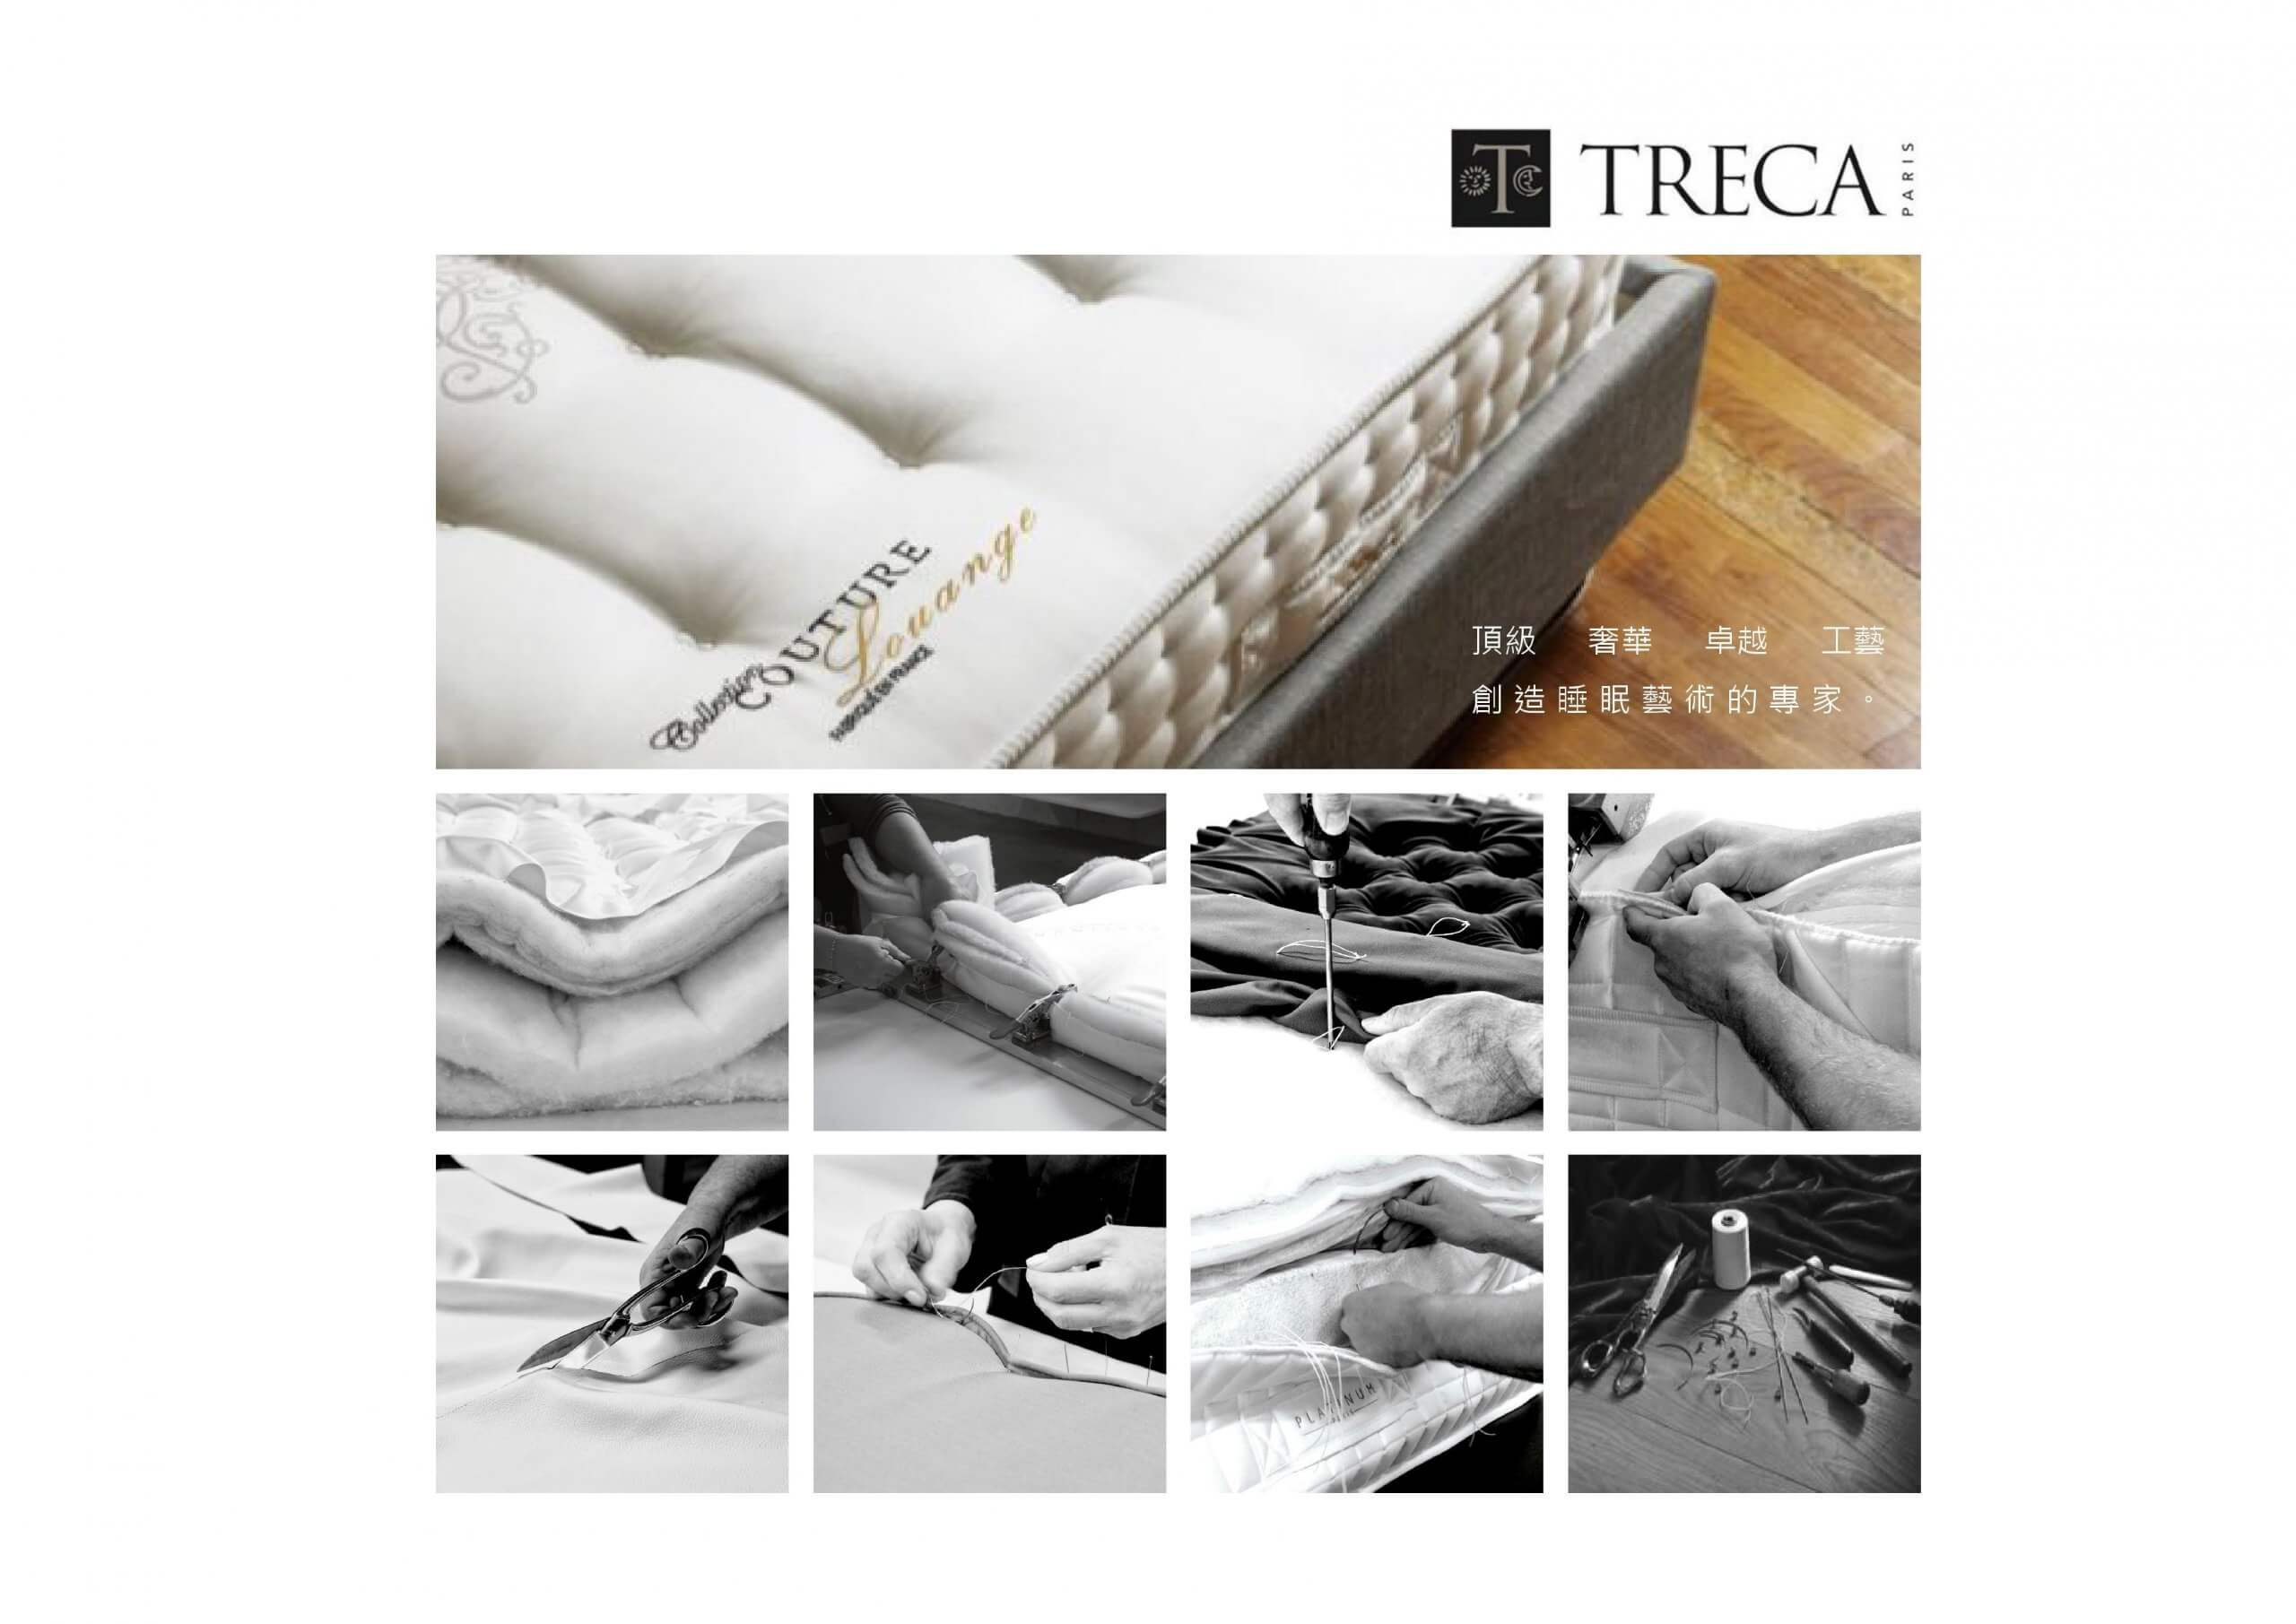 TRECA PARIS 頂級床墊推薦